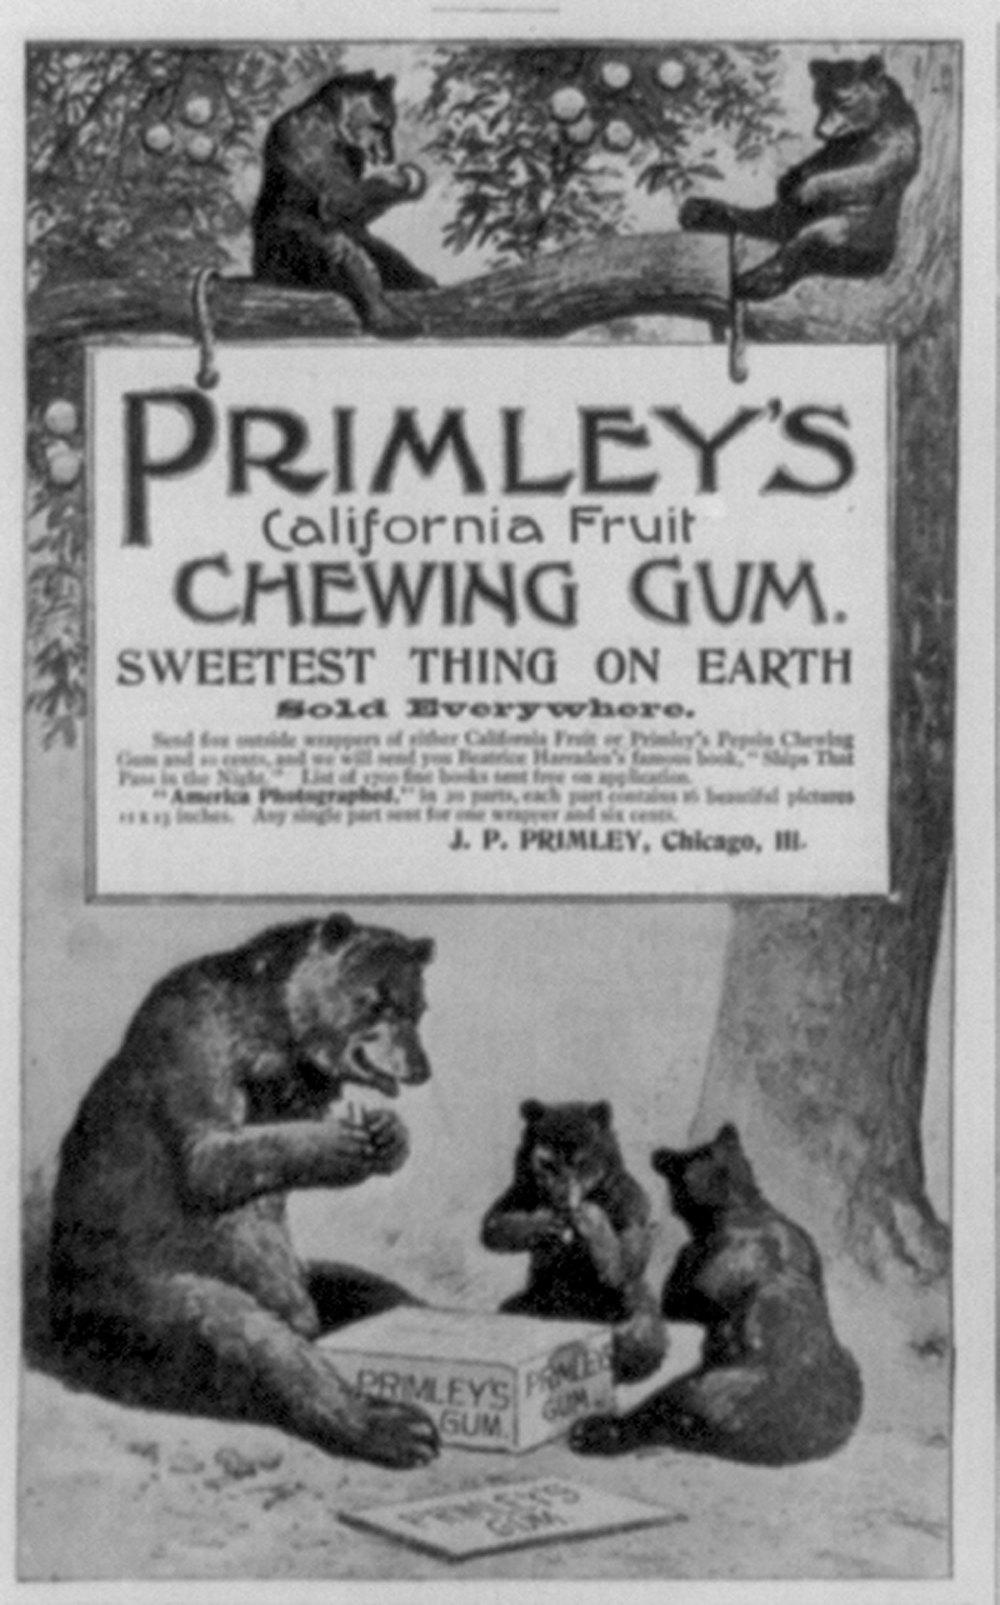 Primleys